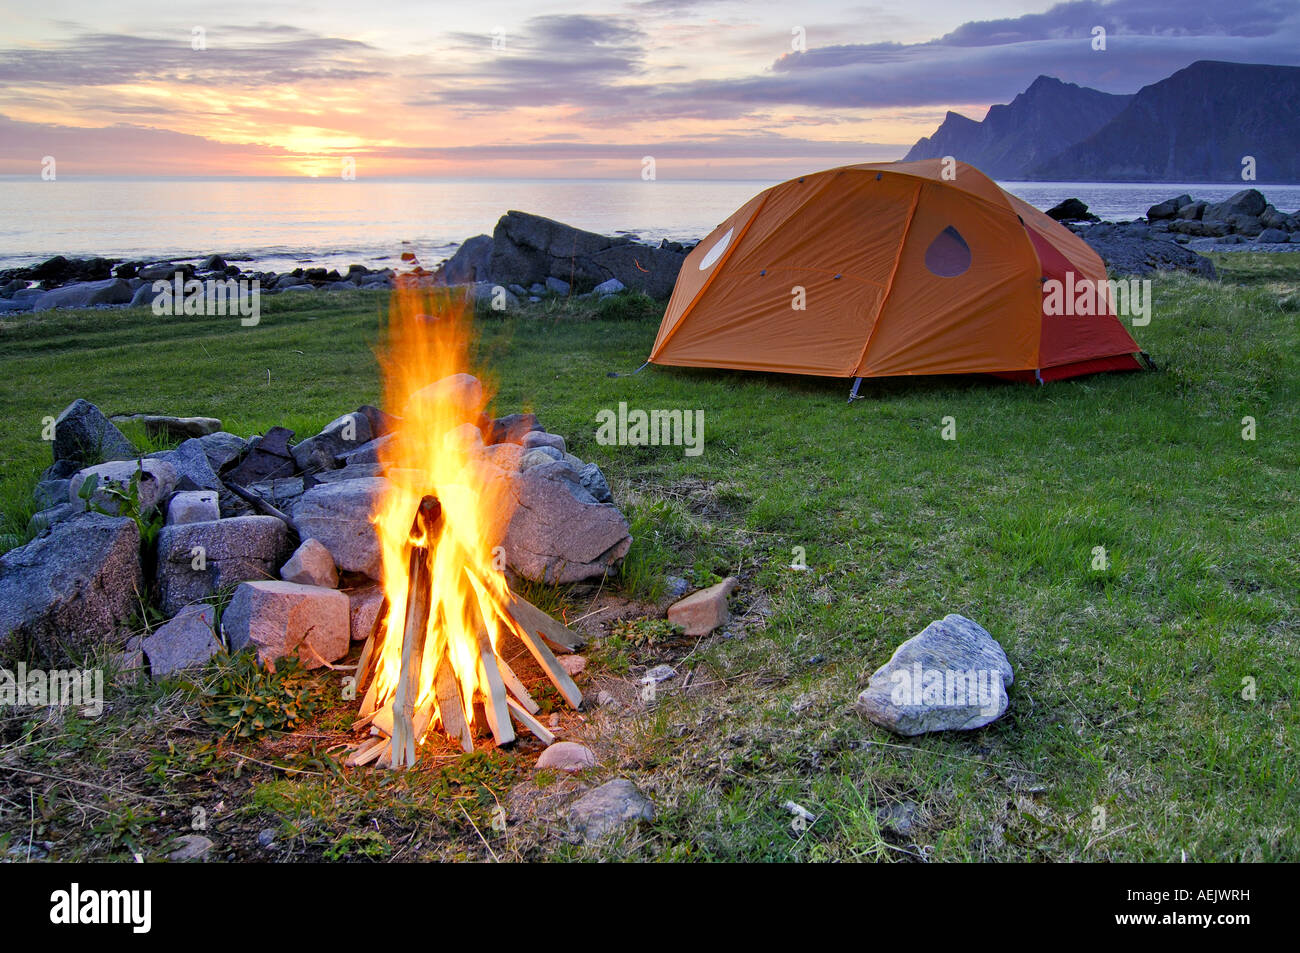 Lagerfeuer mit Zelt, Mitternachtssonne, Austvagoy, Lofoten, Norwegen, Skandinavien, Europa Stockbild